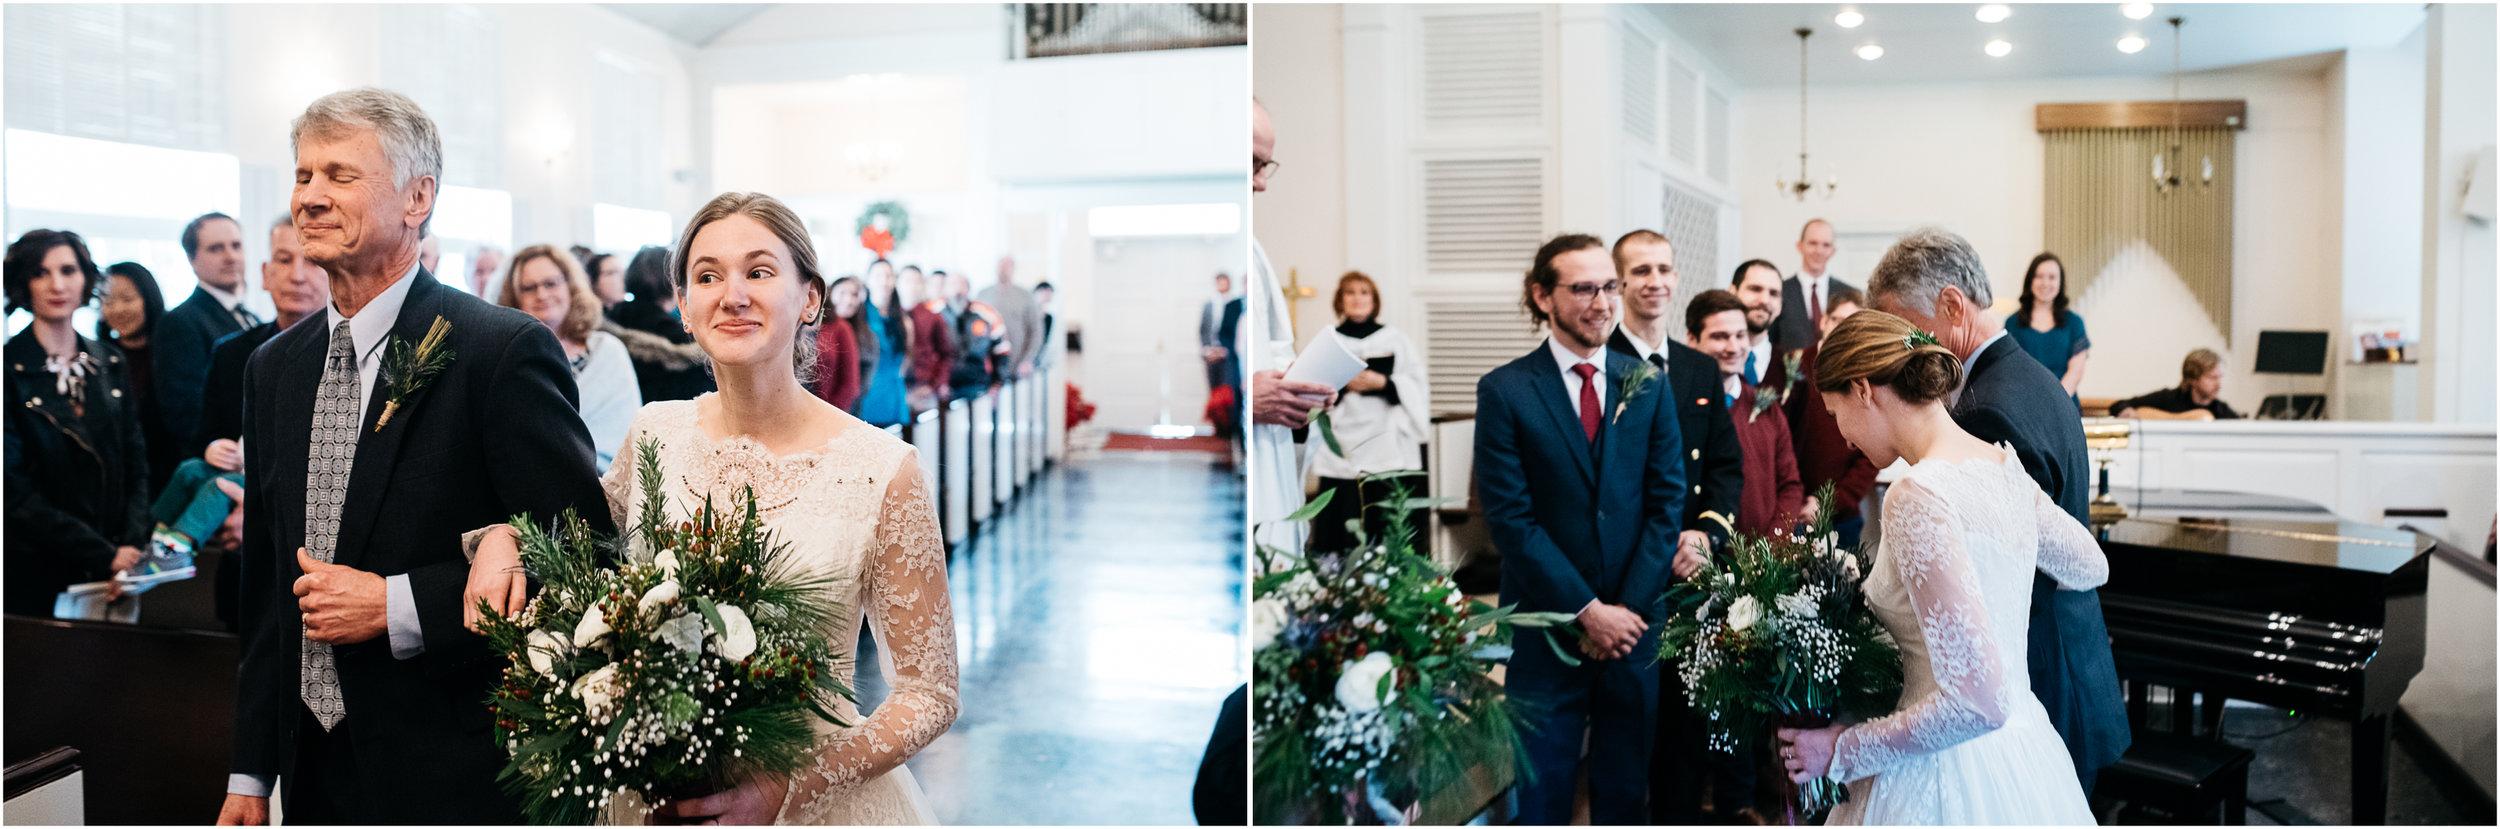 St. Michaels wedding ceremony Ligonier wedding photographer.jpg